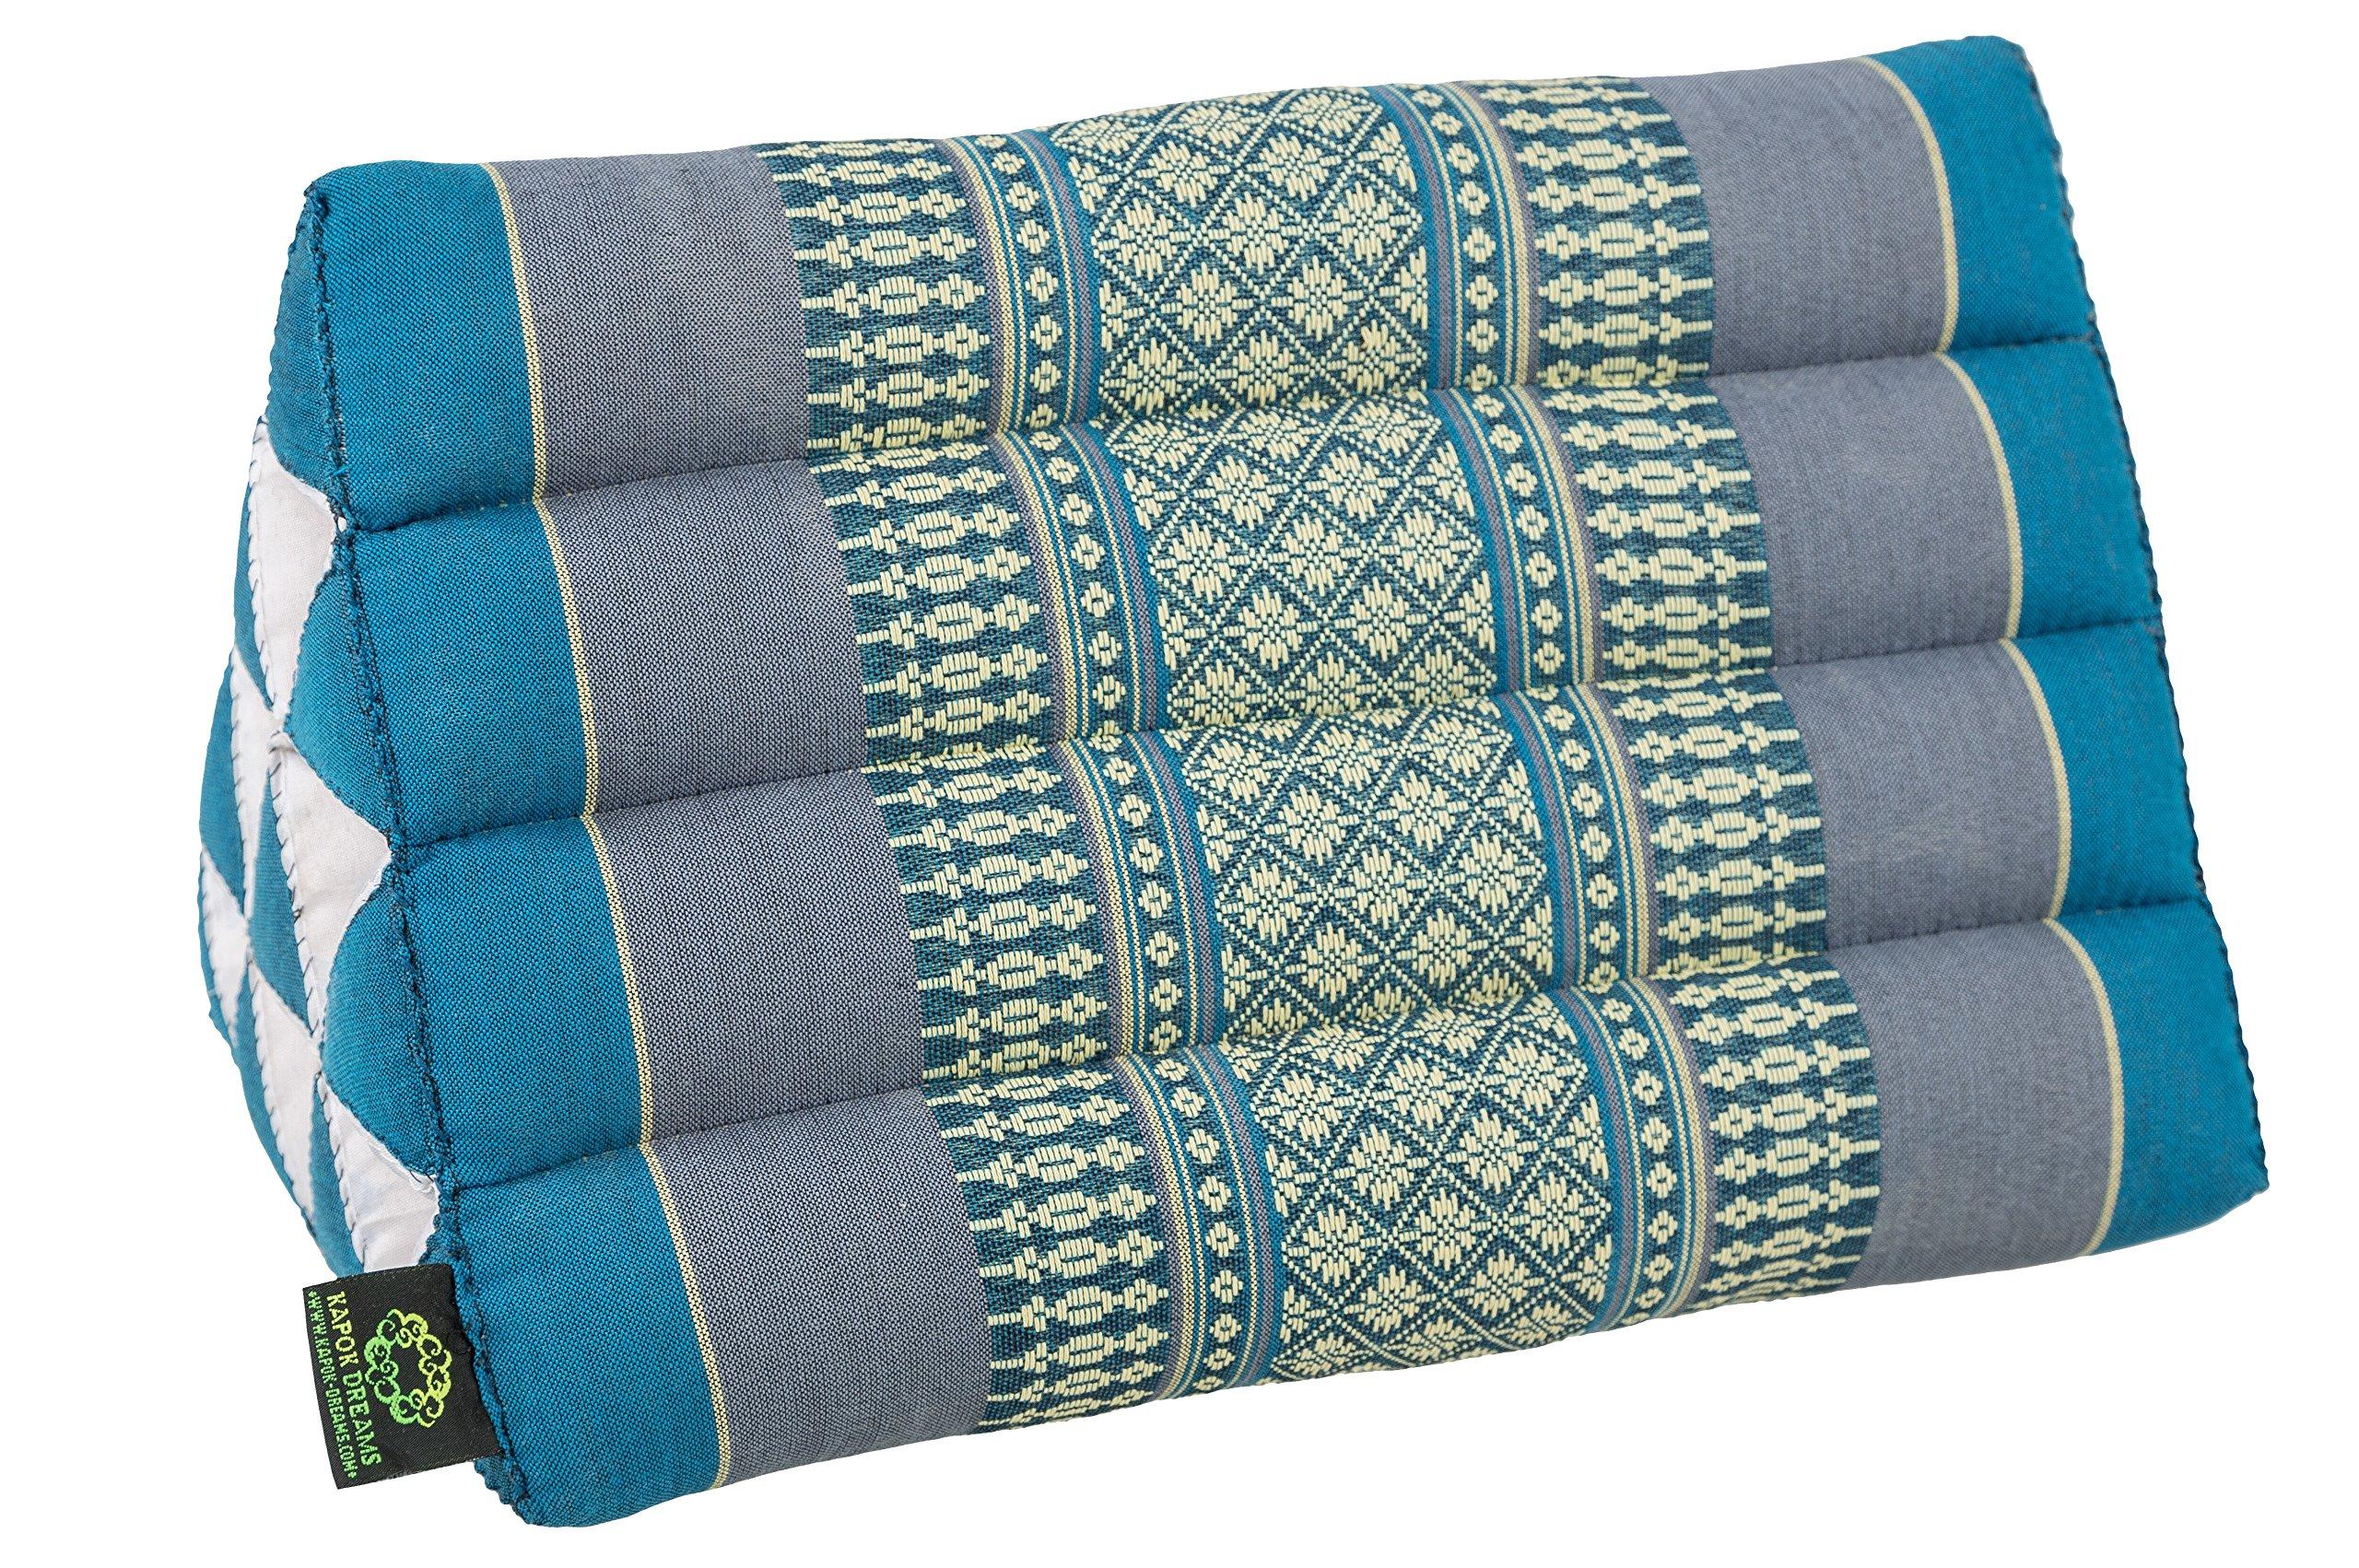 Kapok Dreams Triangle Pillow 13''x8'', Triangular Cushion (Medium Size), 100% Kapok-Stuffing, Blue Tones. by Kapok Dreams